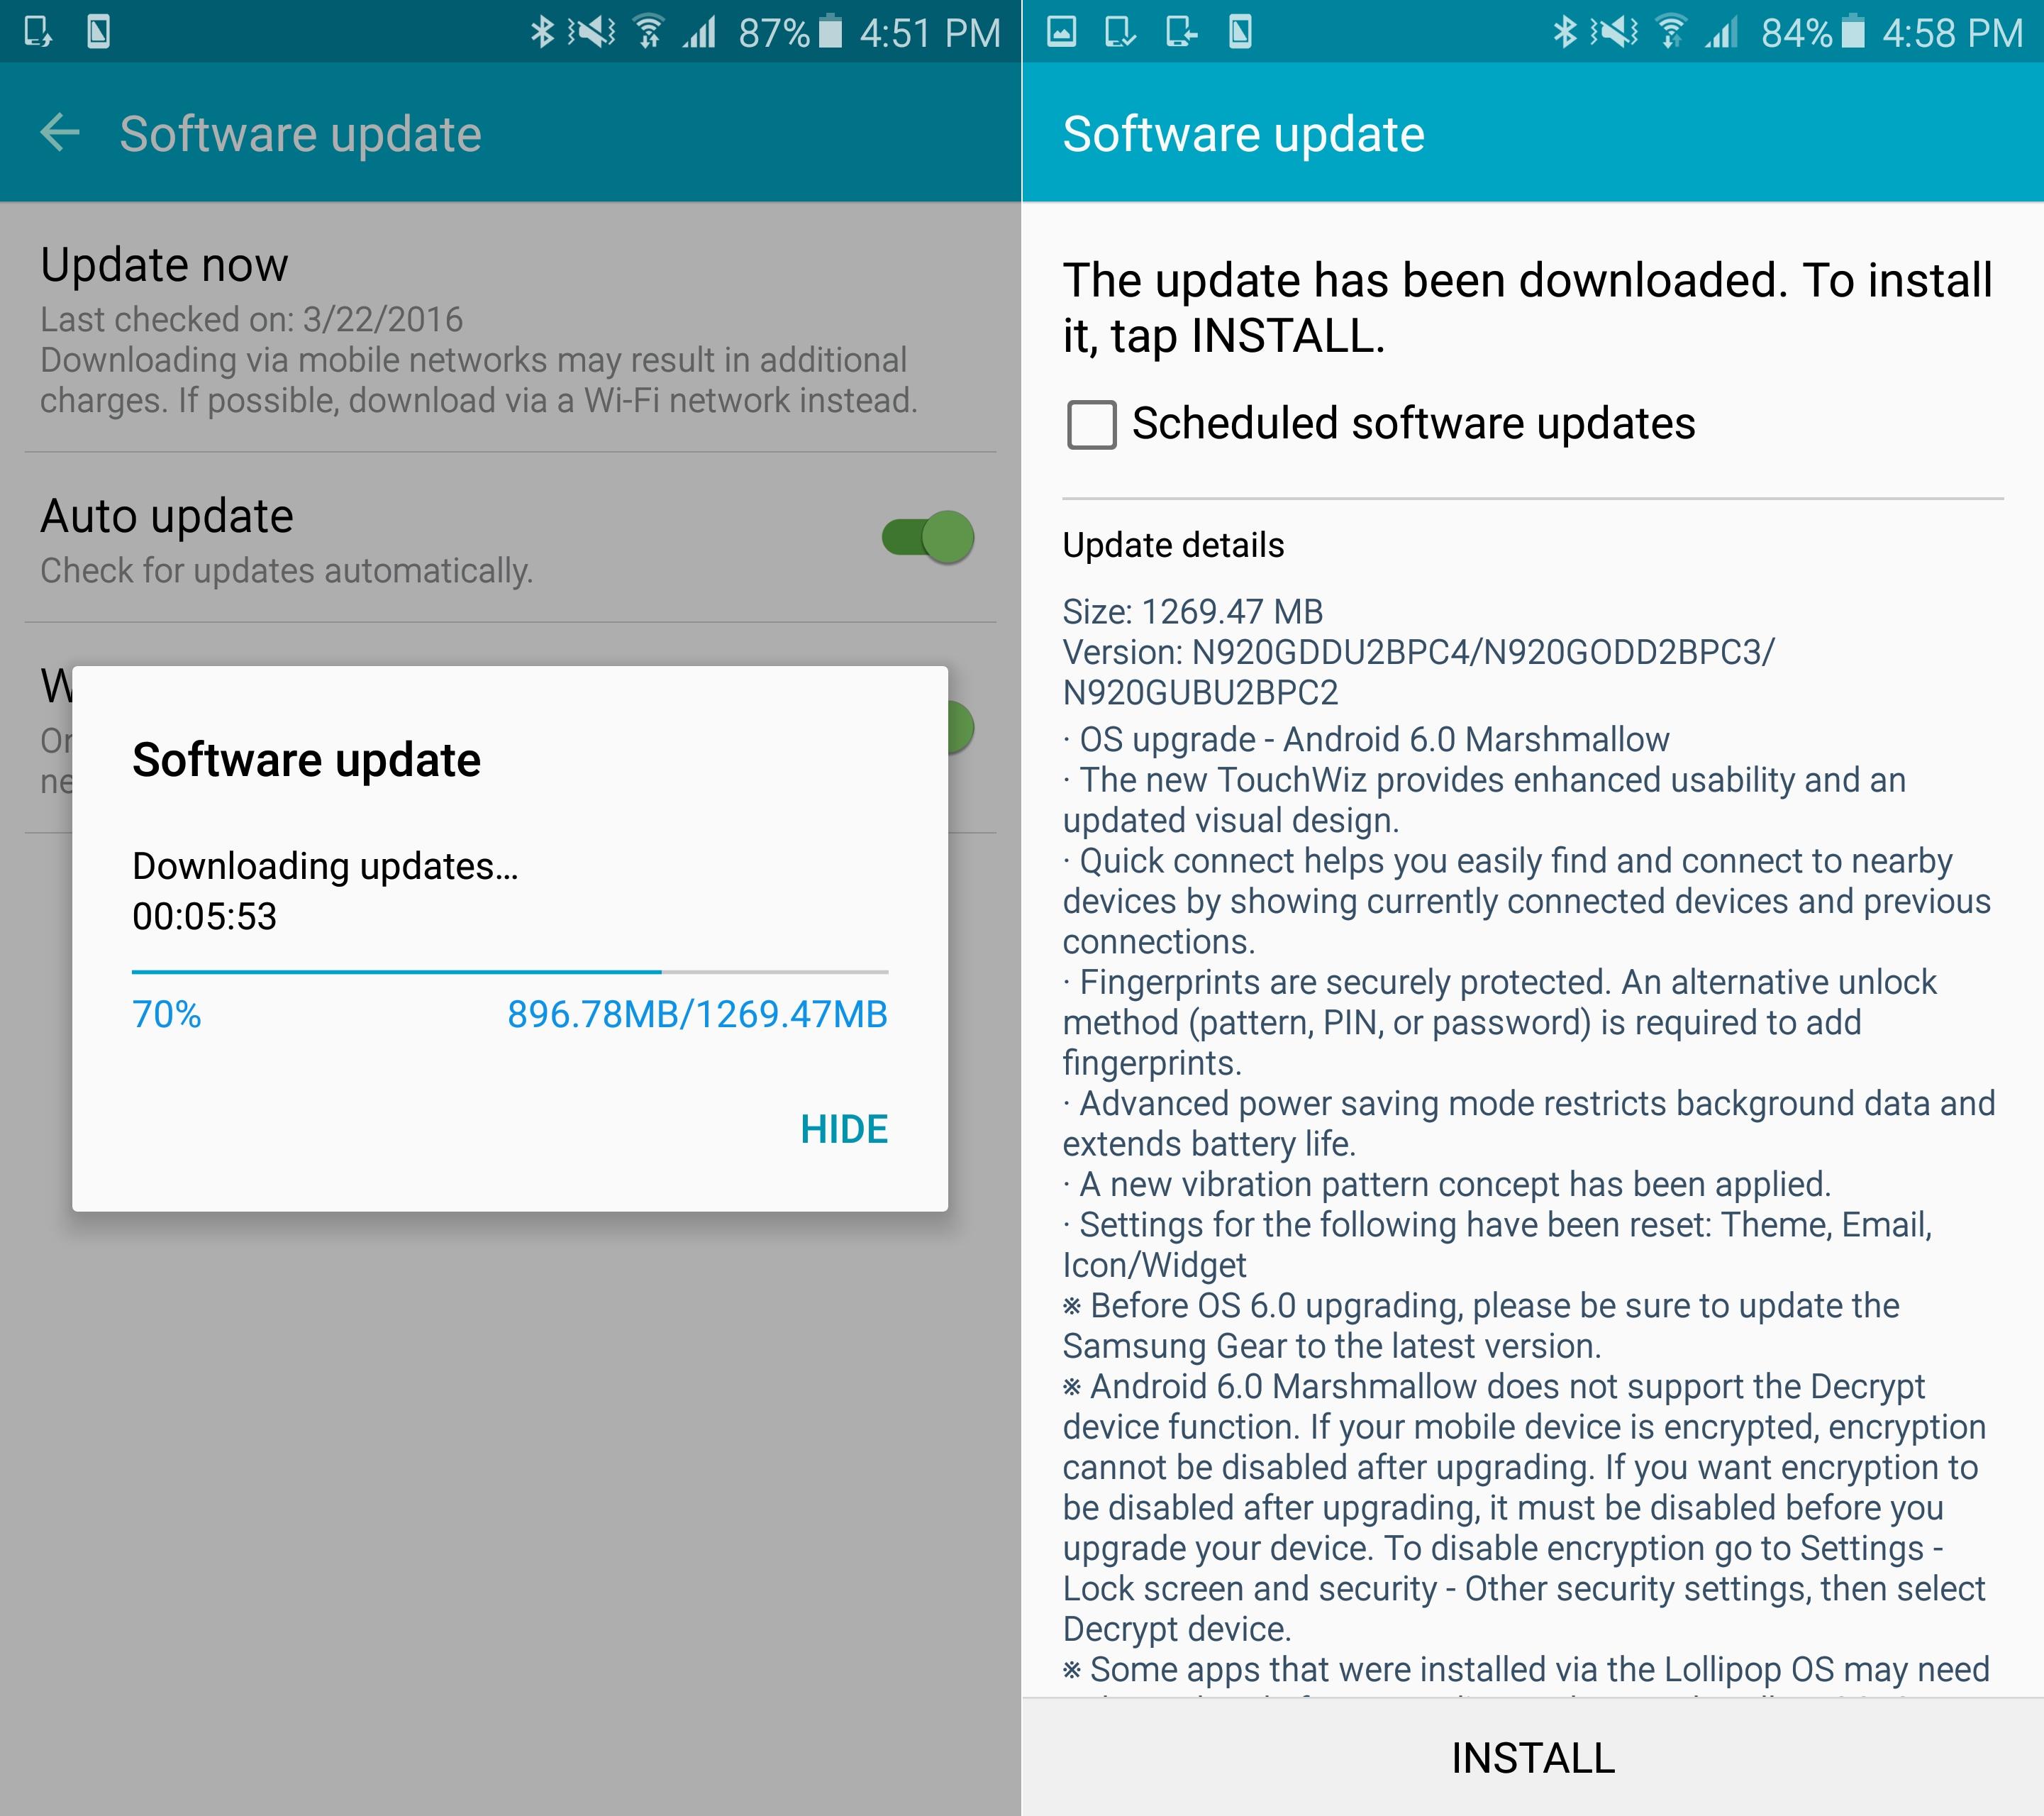 Samsung Galaxy Note 5 starts getting Marshmallow update in